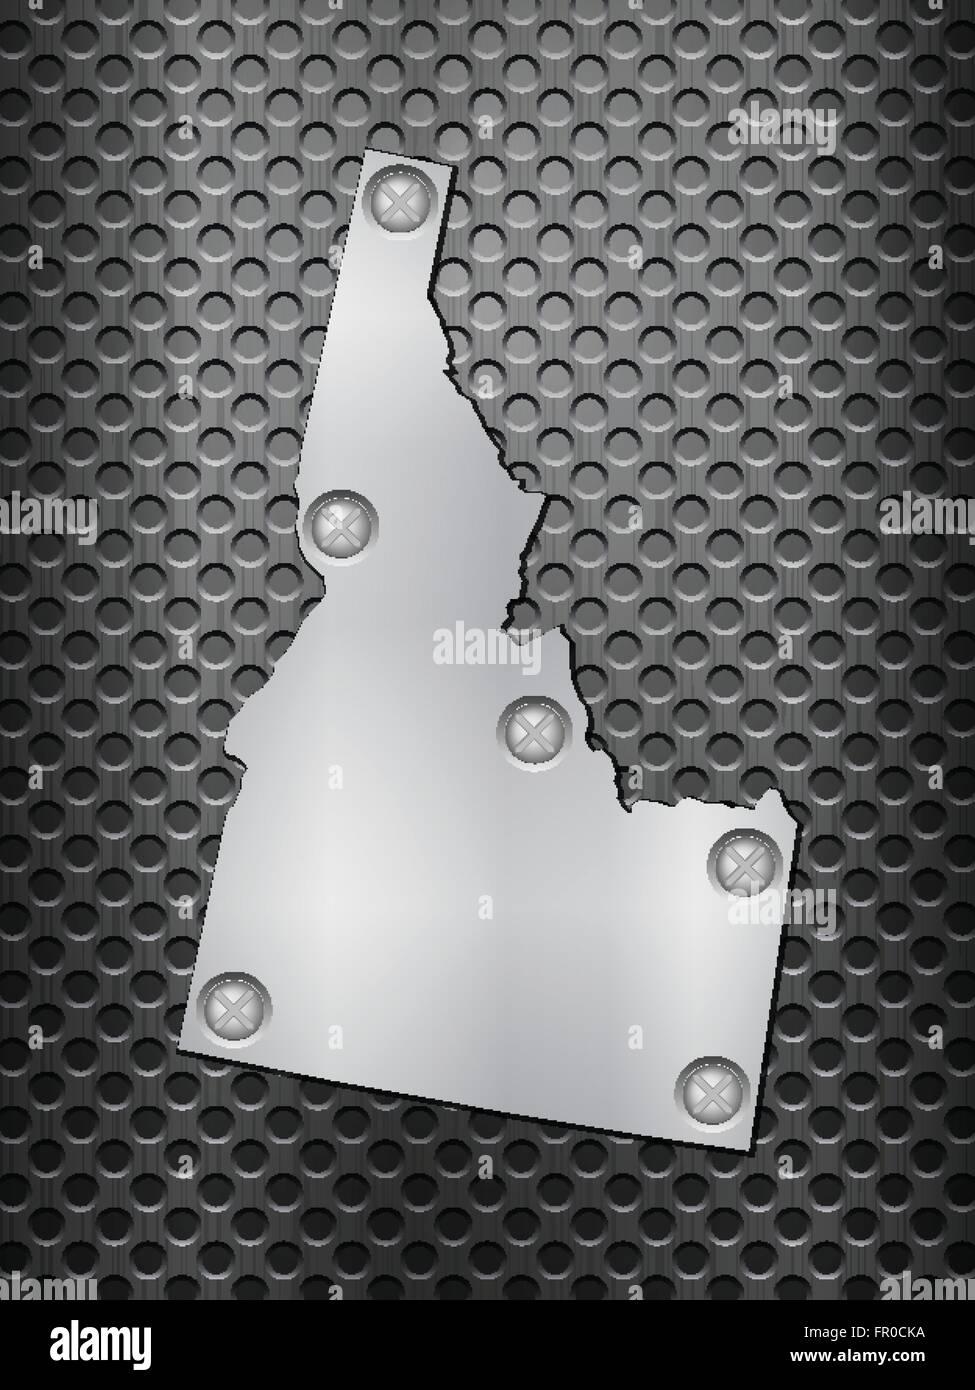 Idaho metal map on a black metal grid. - Stock Vector